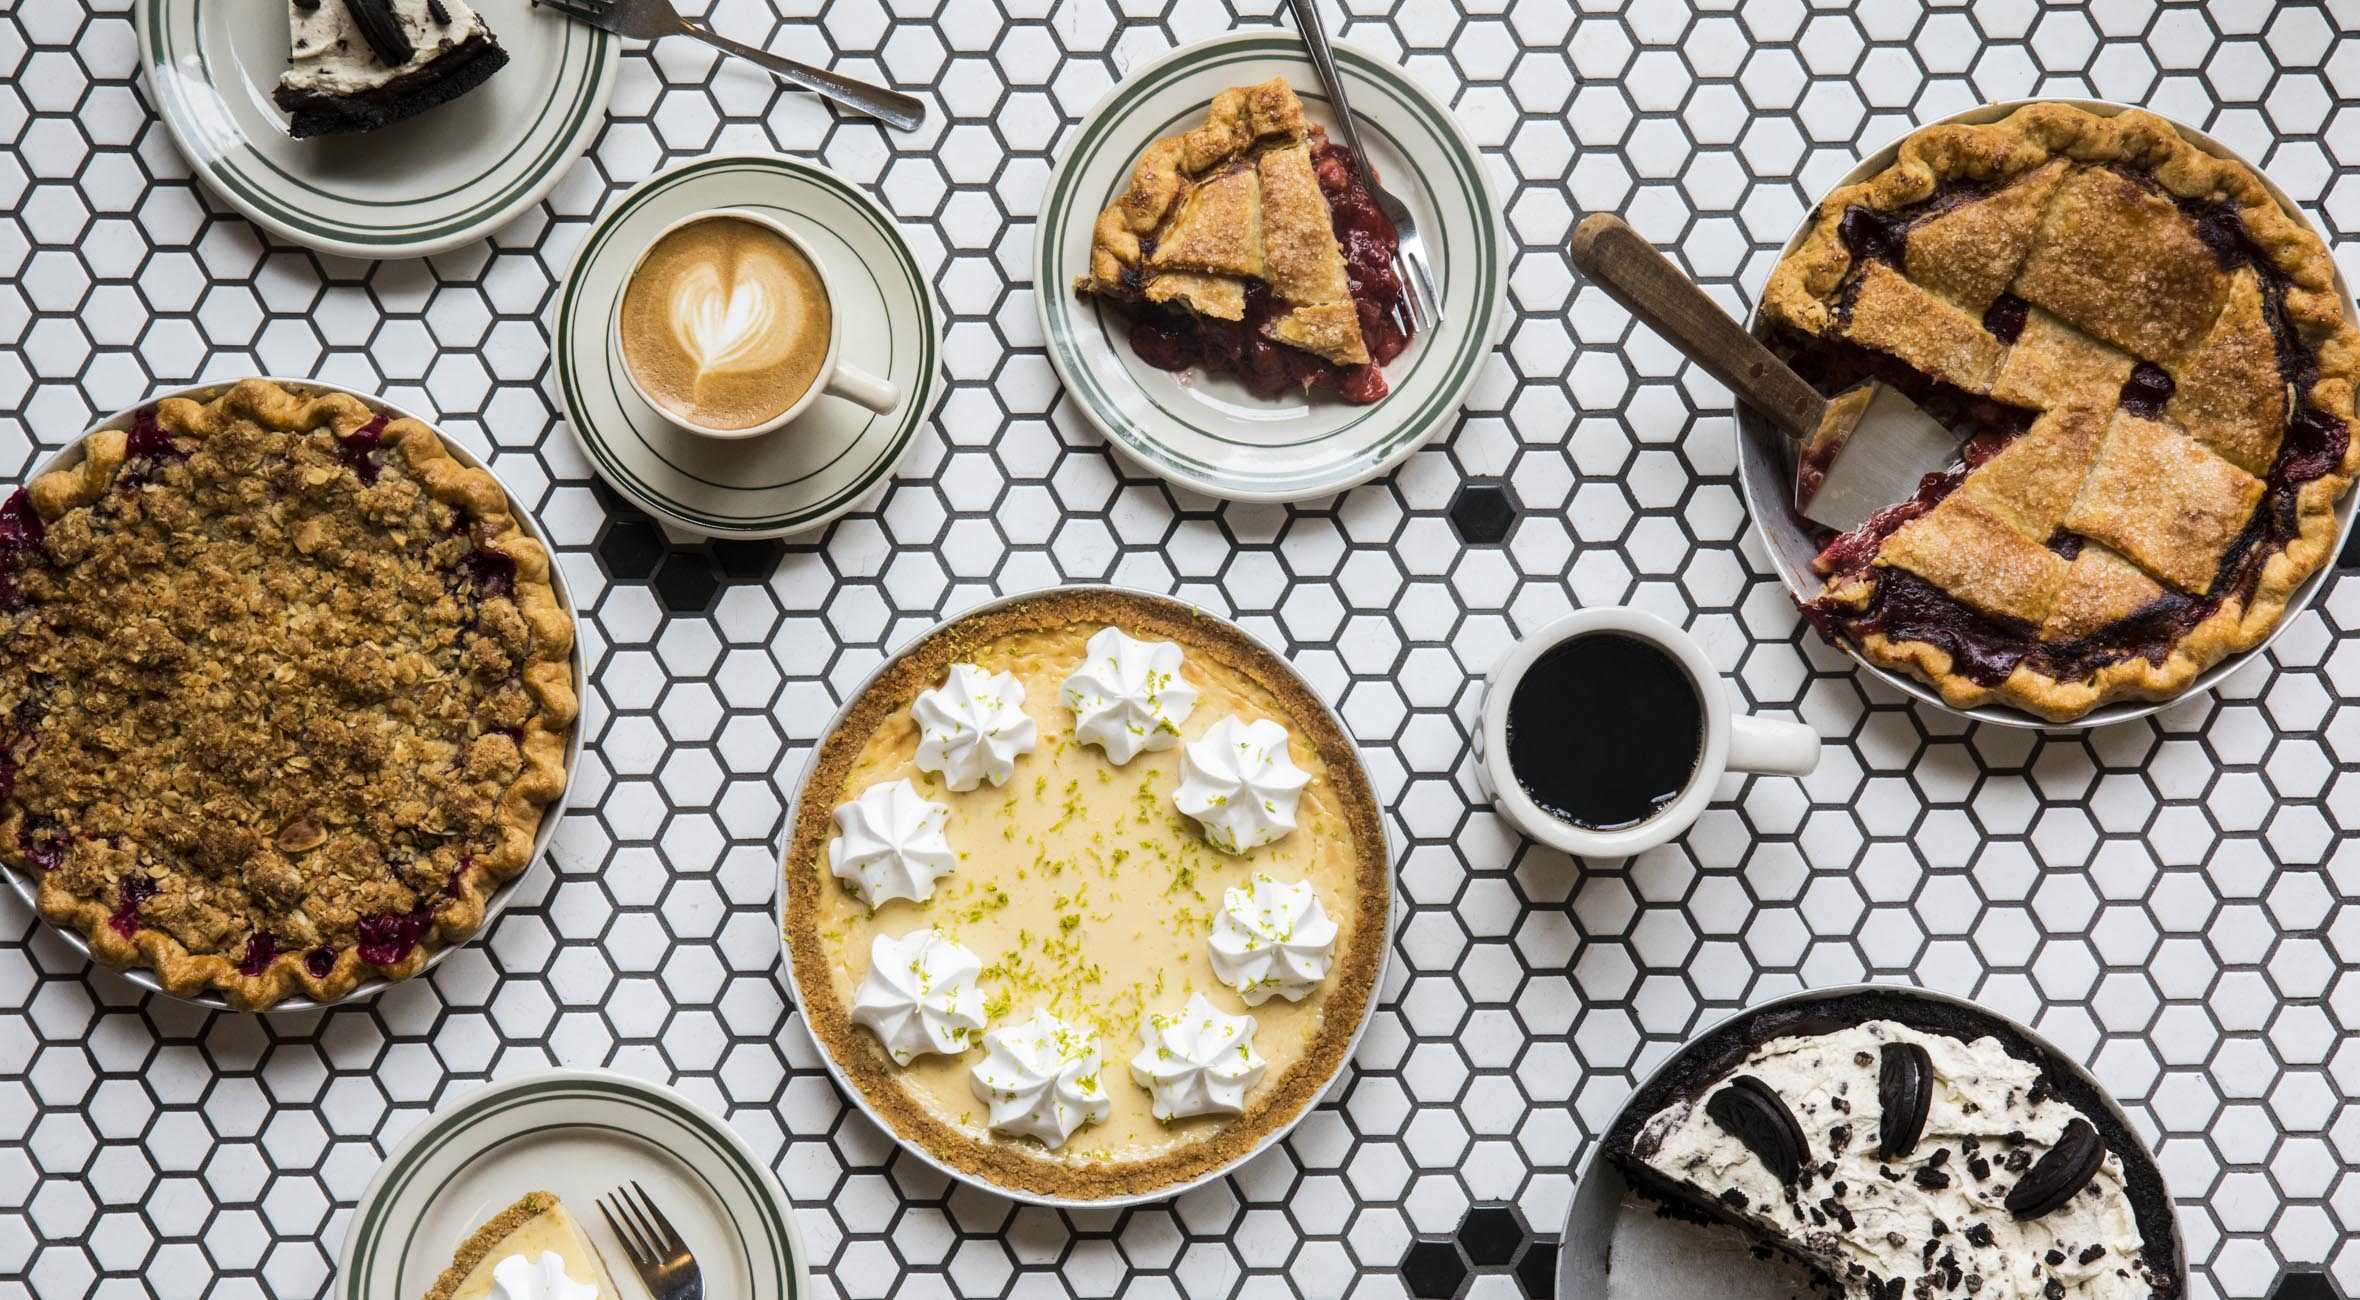 2 stk. sweet pie + 2 drikke hos The American Pie Company – Populær pie-pusher har indtaget Vesterbro